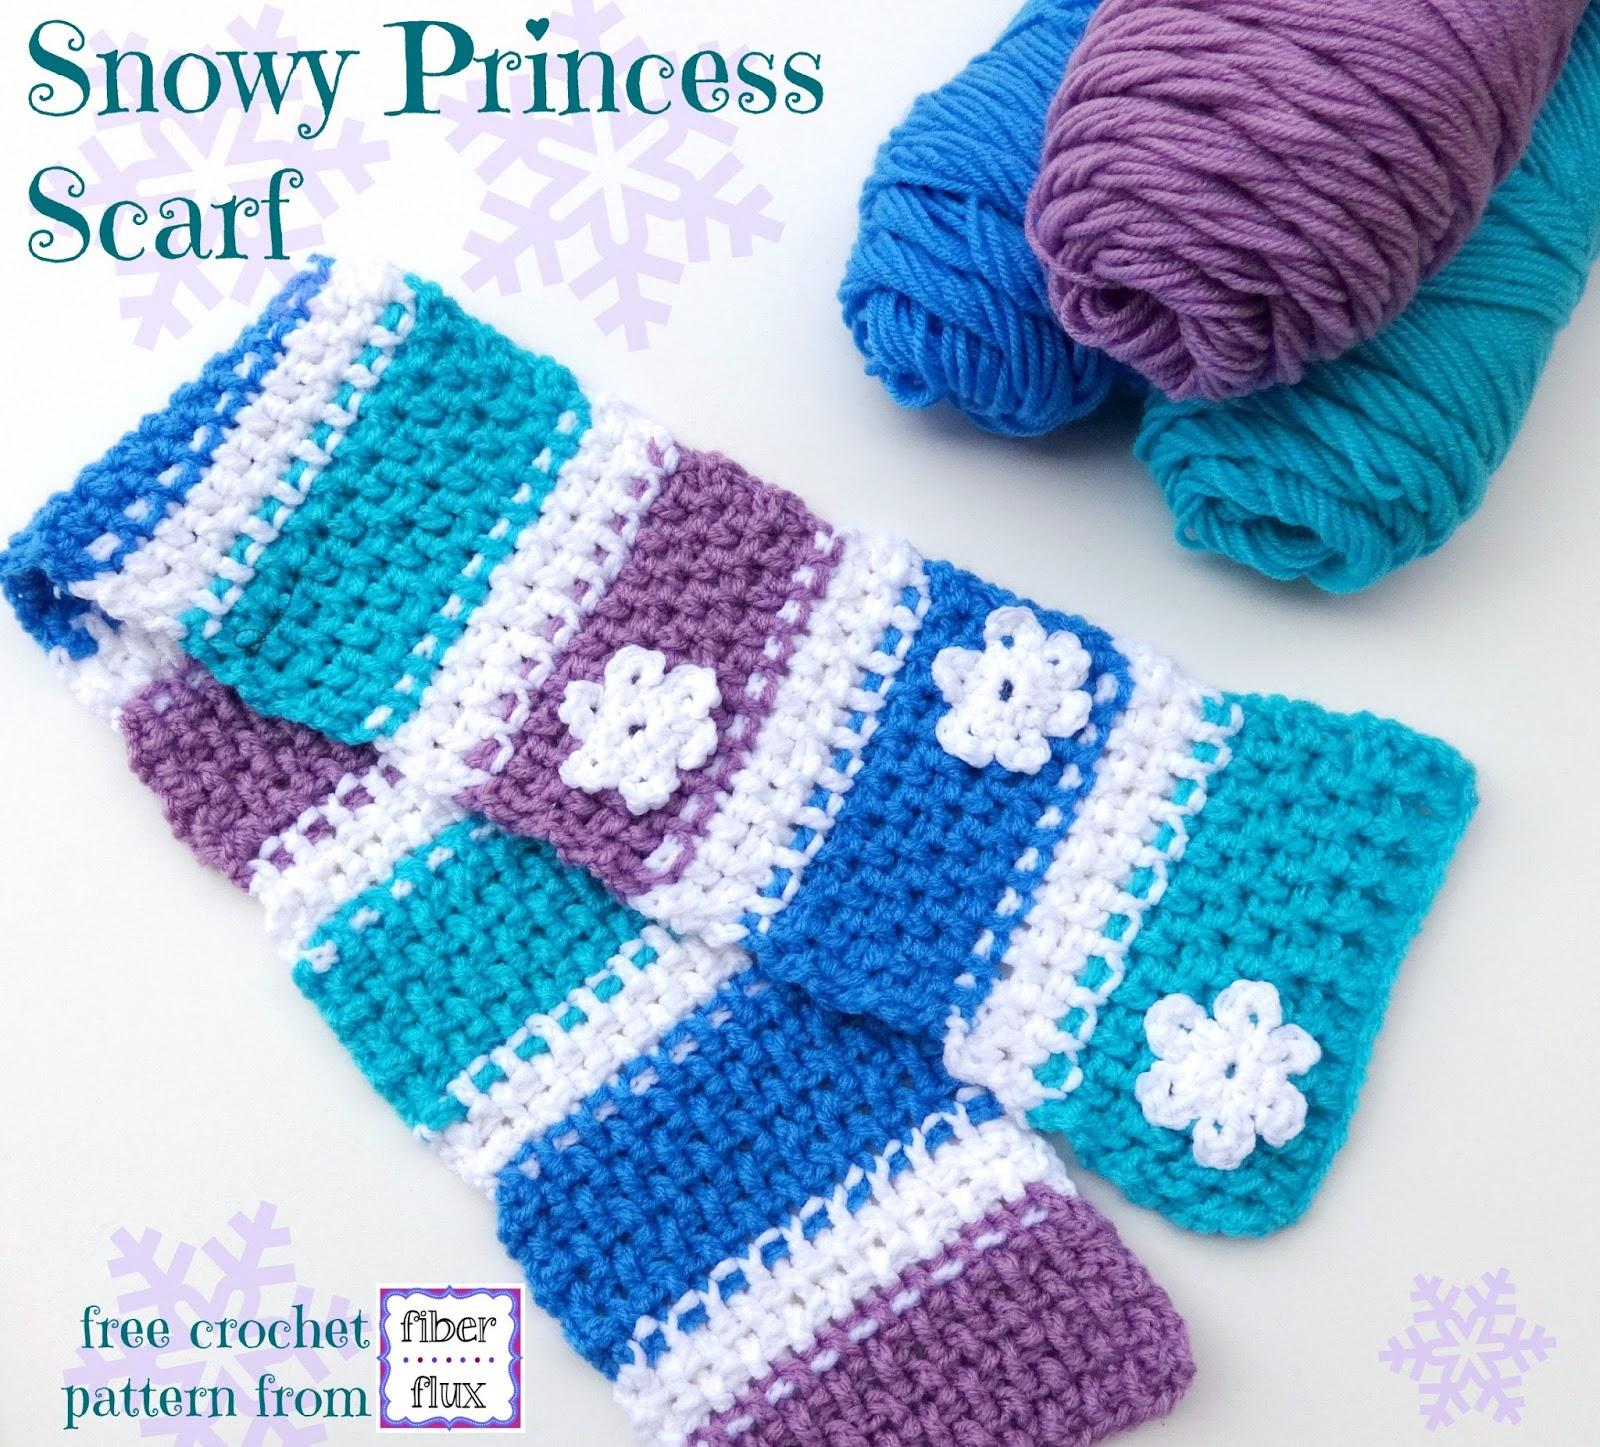 Fiber Flux Free Crochet Patternowy Princess Scarf